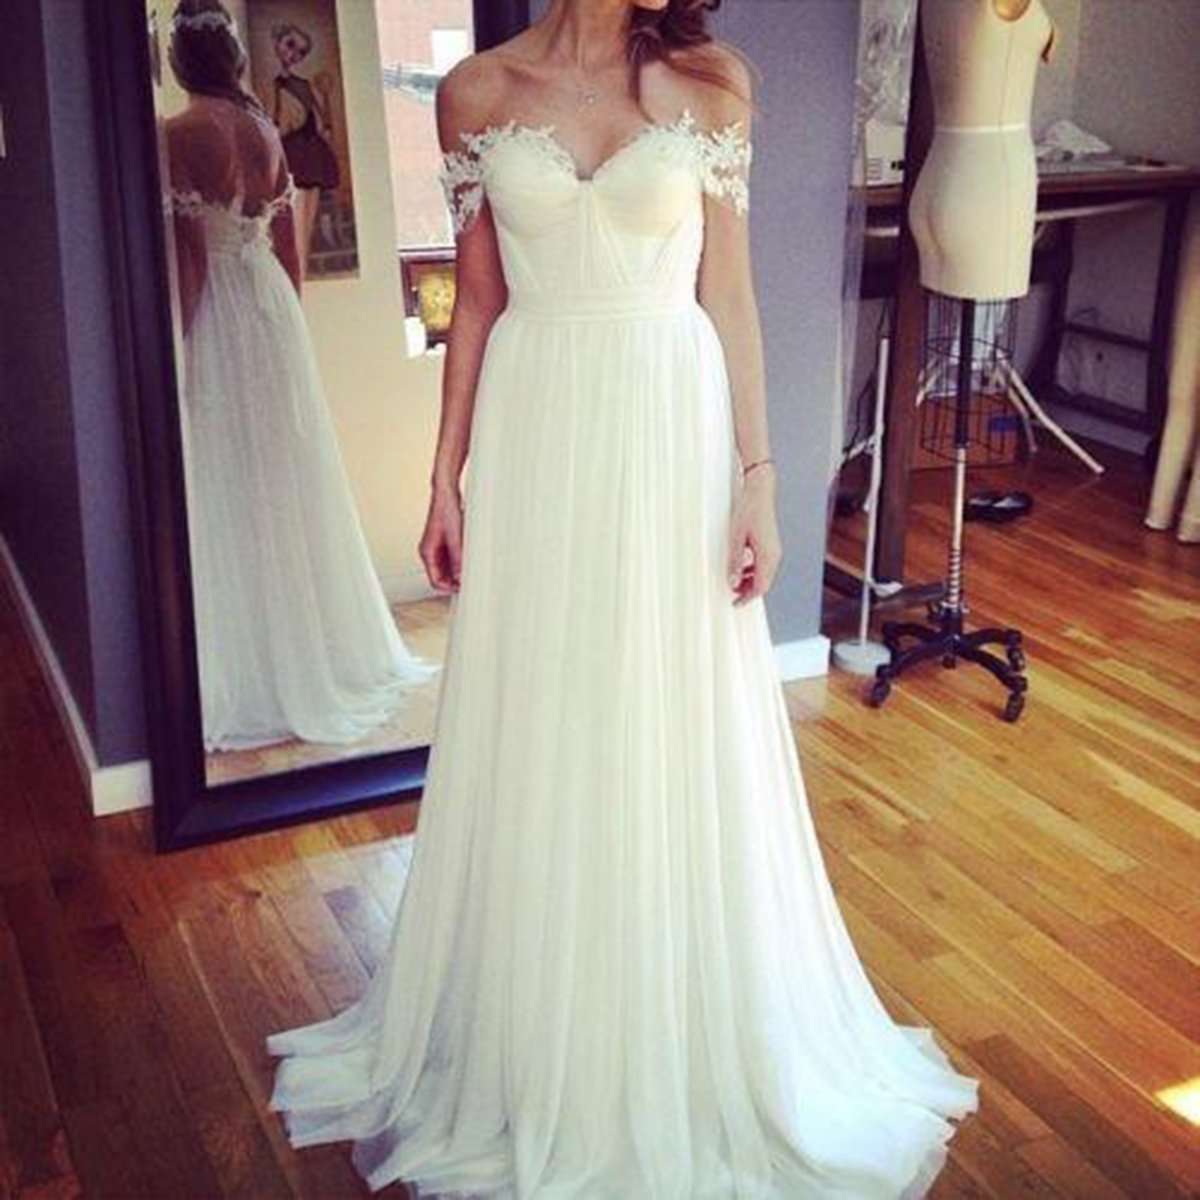 Udresses Chiffon Lace Vestidos de Novia 2017 Beach Bridal Wedding Dresses DR3 at Amazon Womens Clothing store: